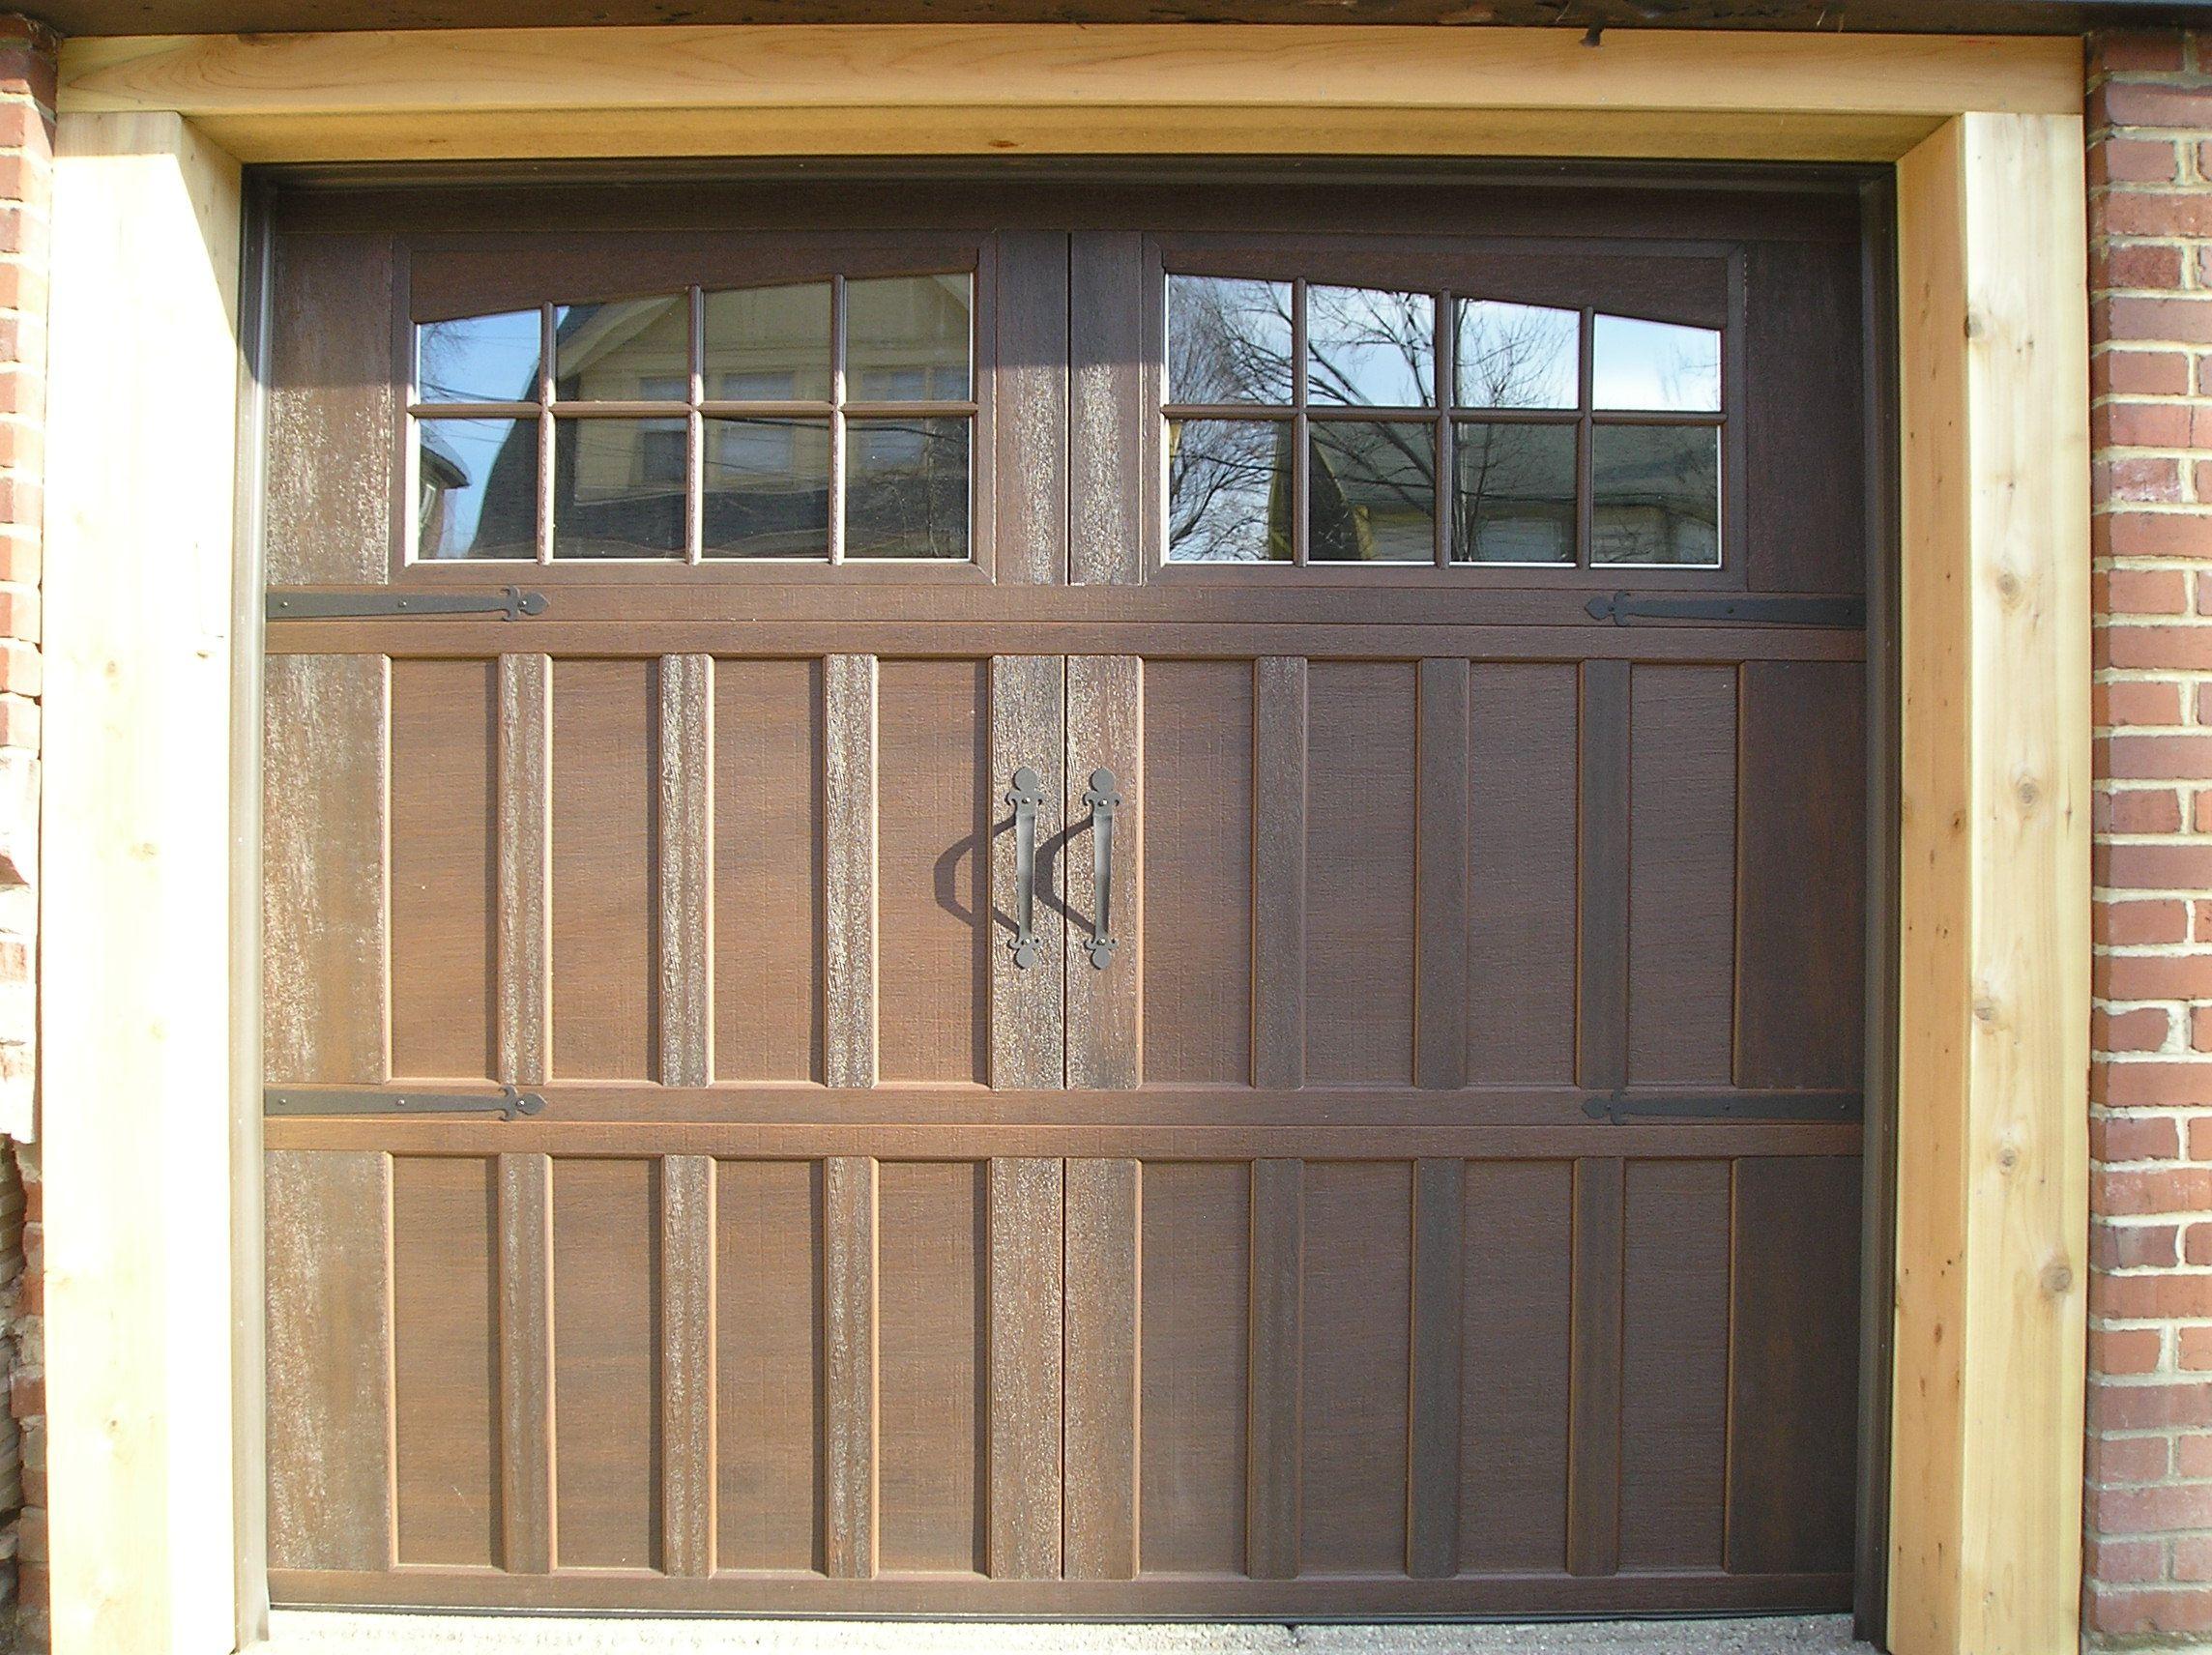 Wayne dalton 9700 garage doors - Wayne Dalton 9700 Garage Door